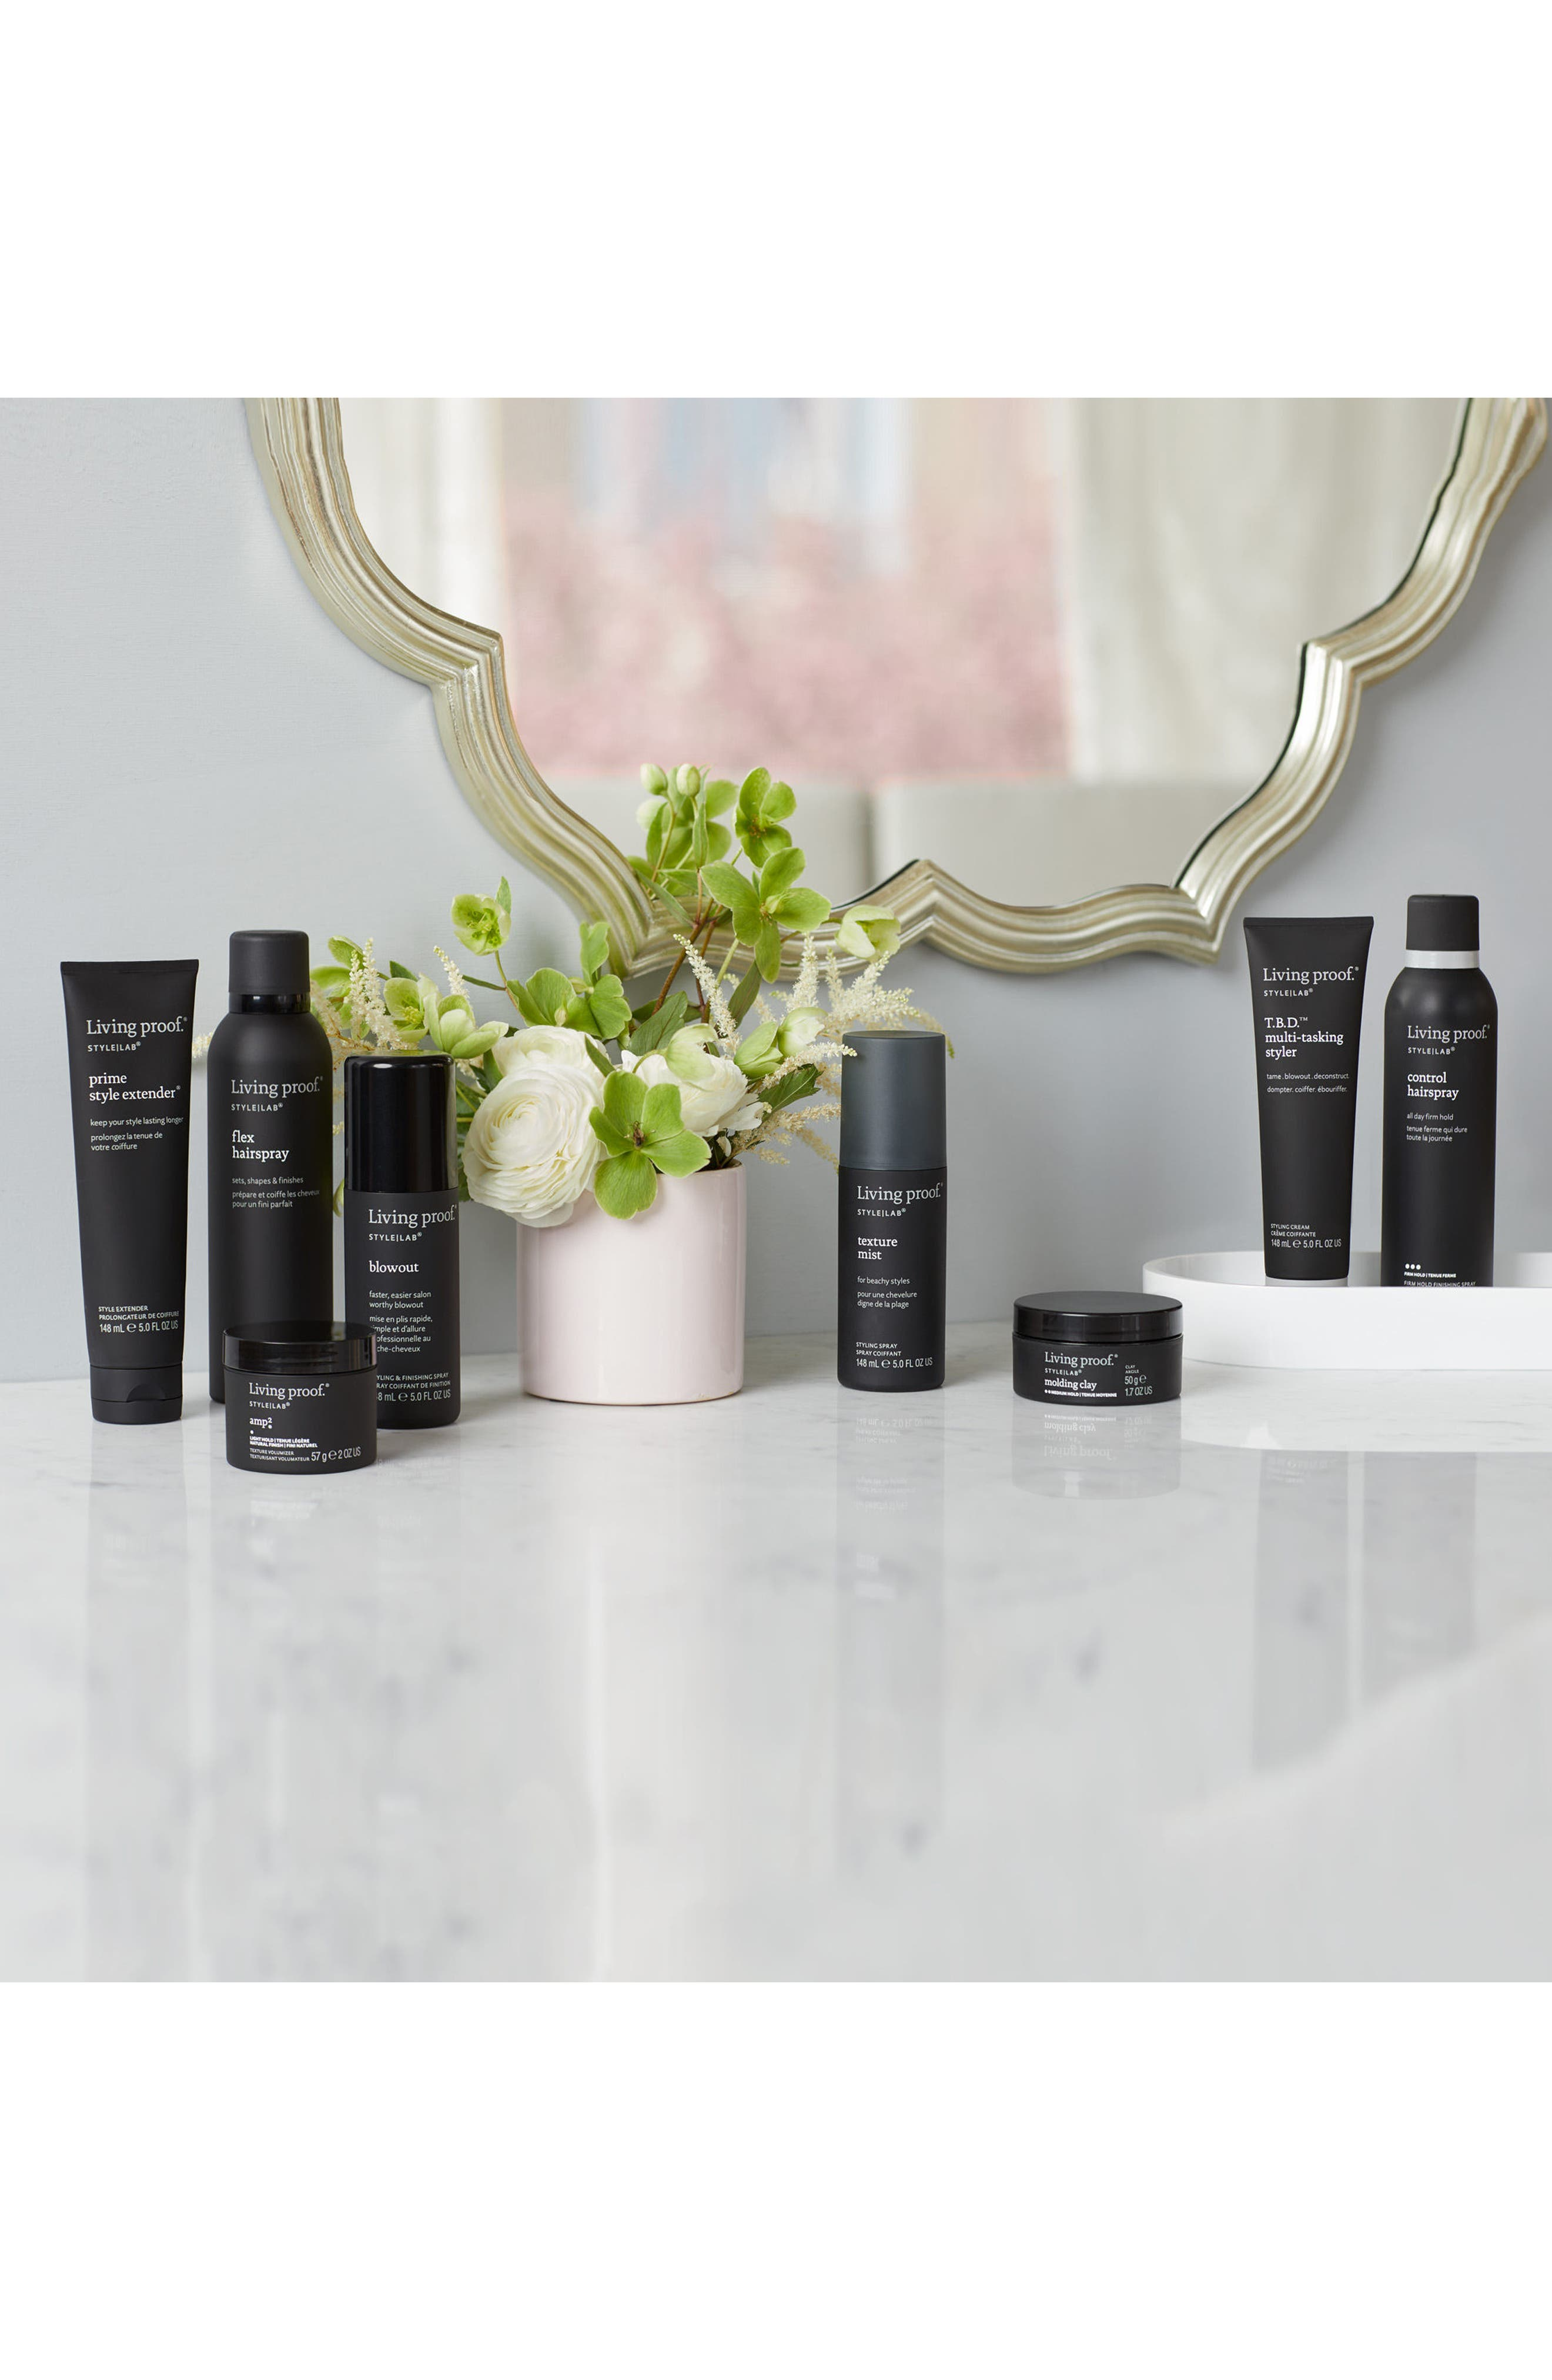 Alternate Image 3  - Living proof® Flex Hairspray